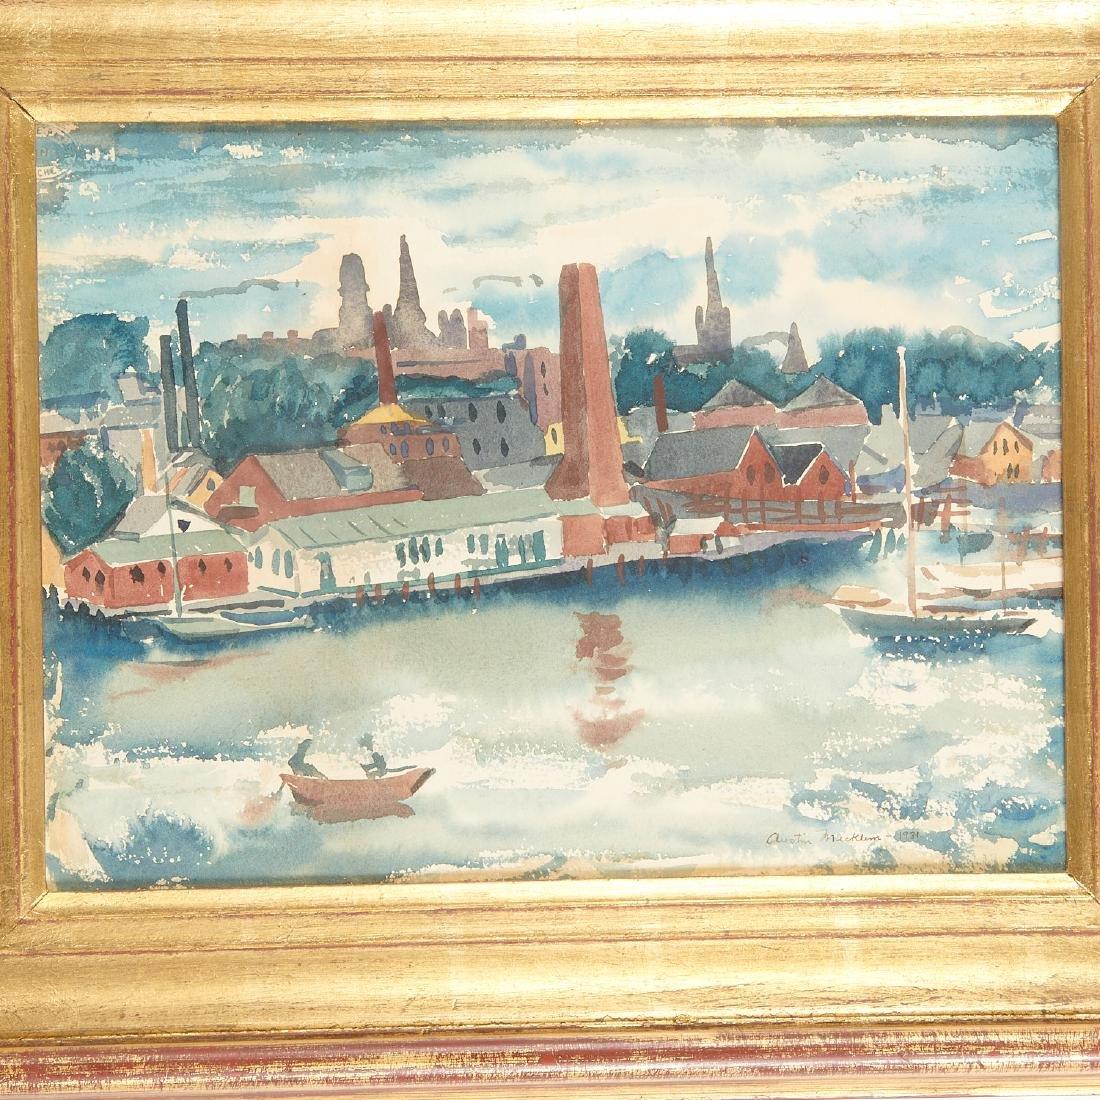 Austin Mecklem, painting, 1931 - 2